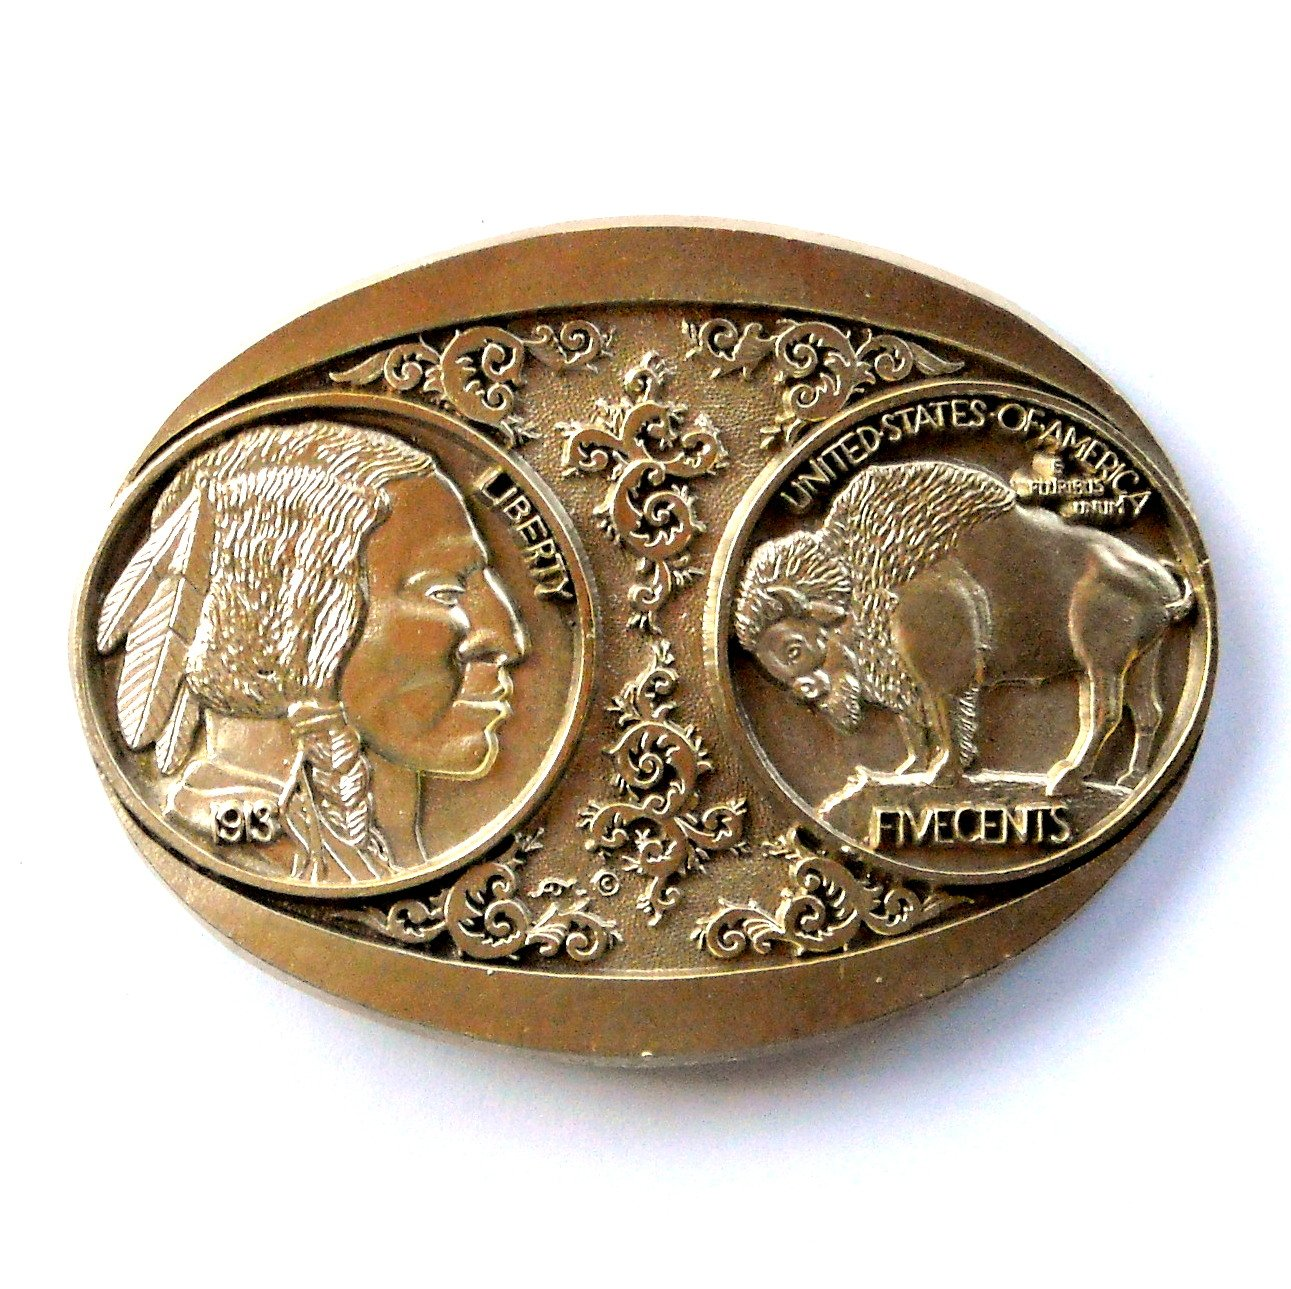 Buffalo Nickel Five Cents Award Design Solid Brass Belt Buckle